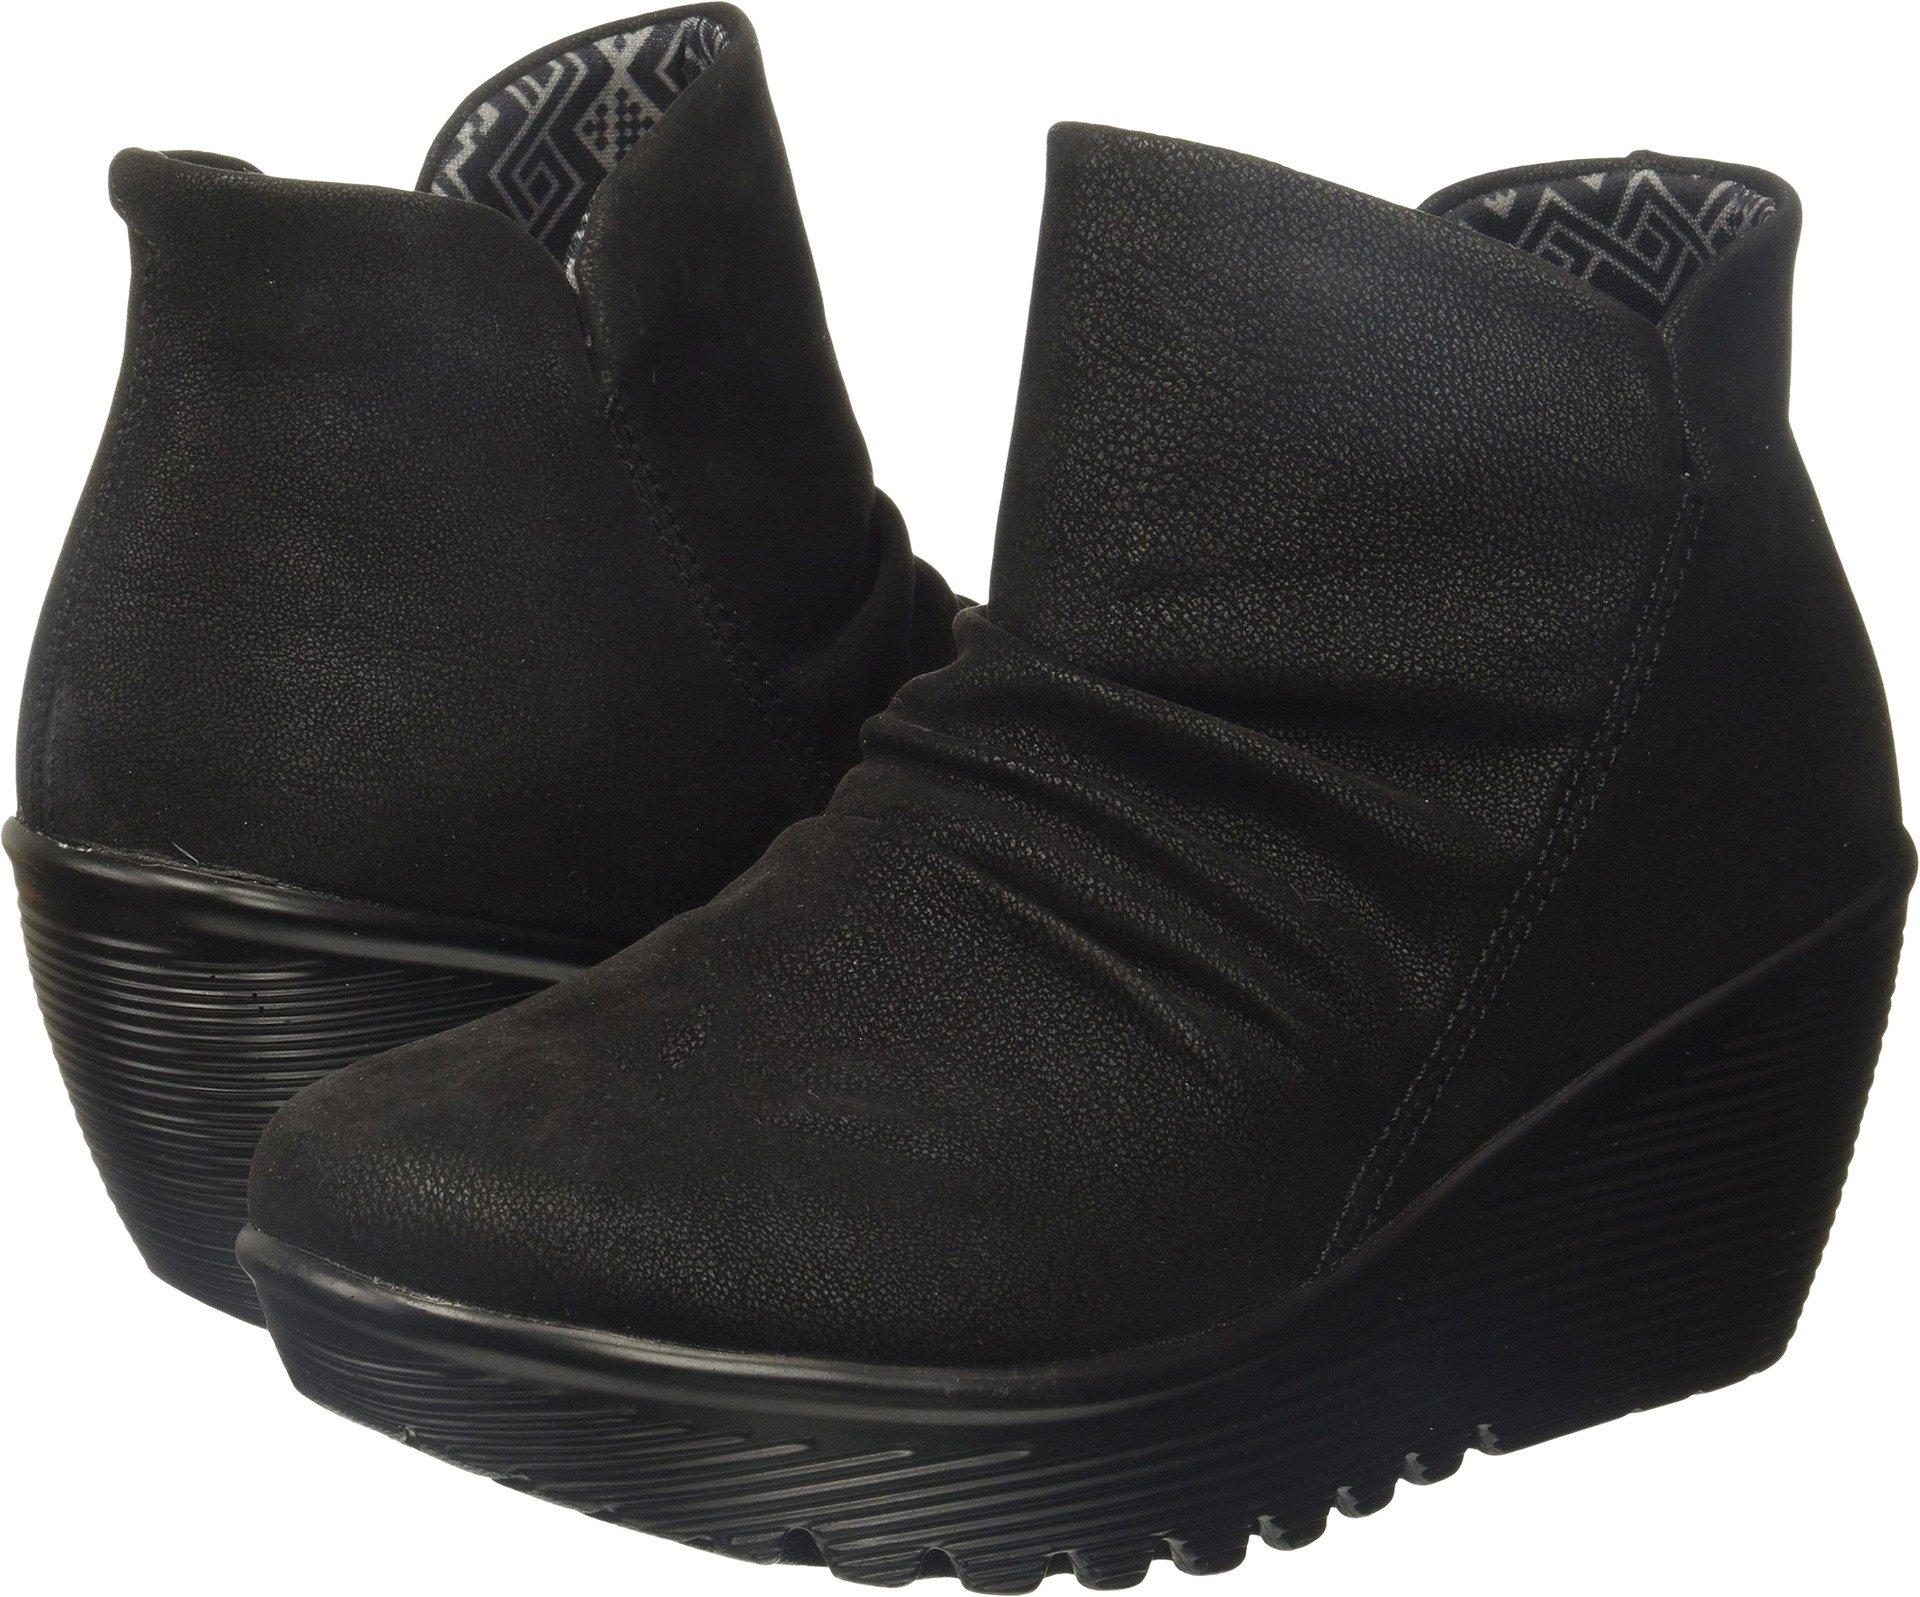 Skechers Women's Parallel-Dusk Ankle Bootie,Black,6.5 M US